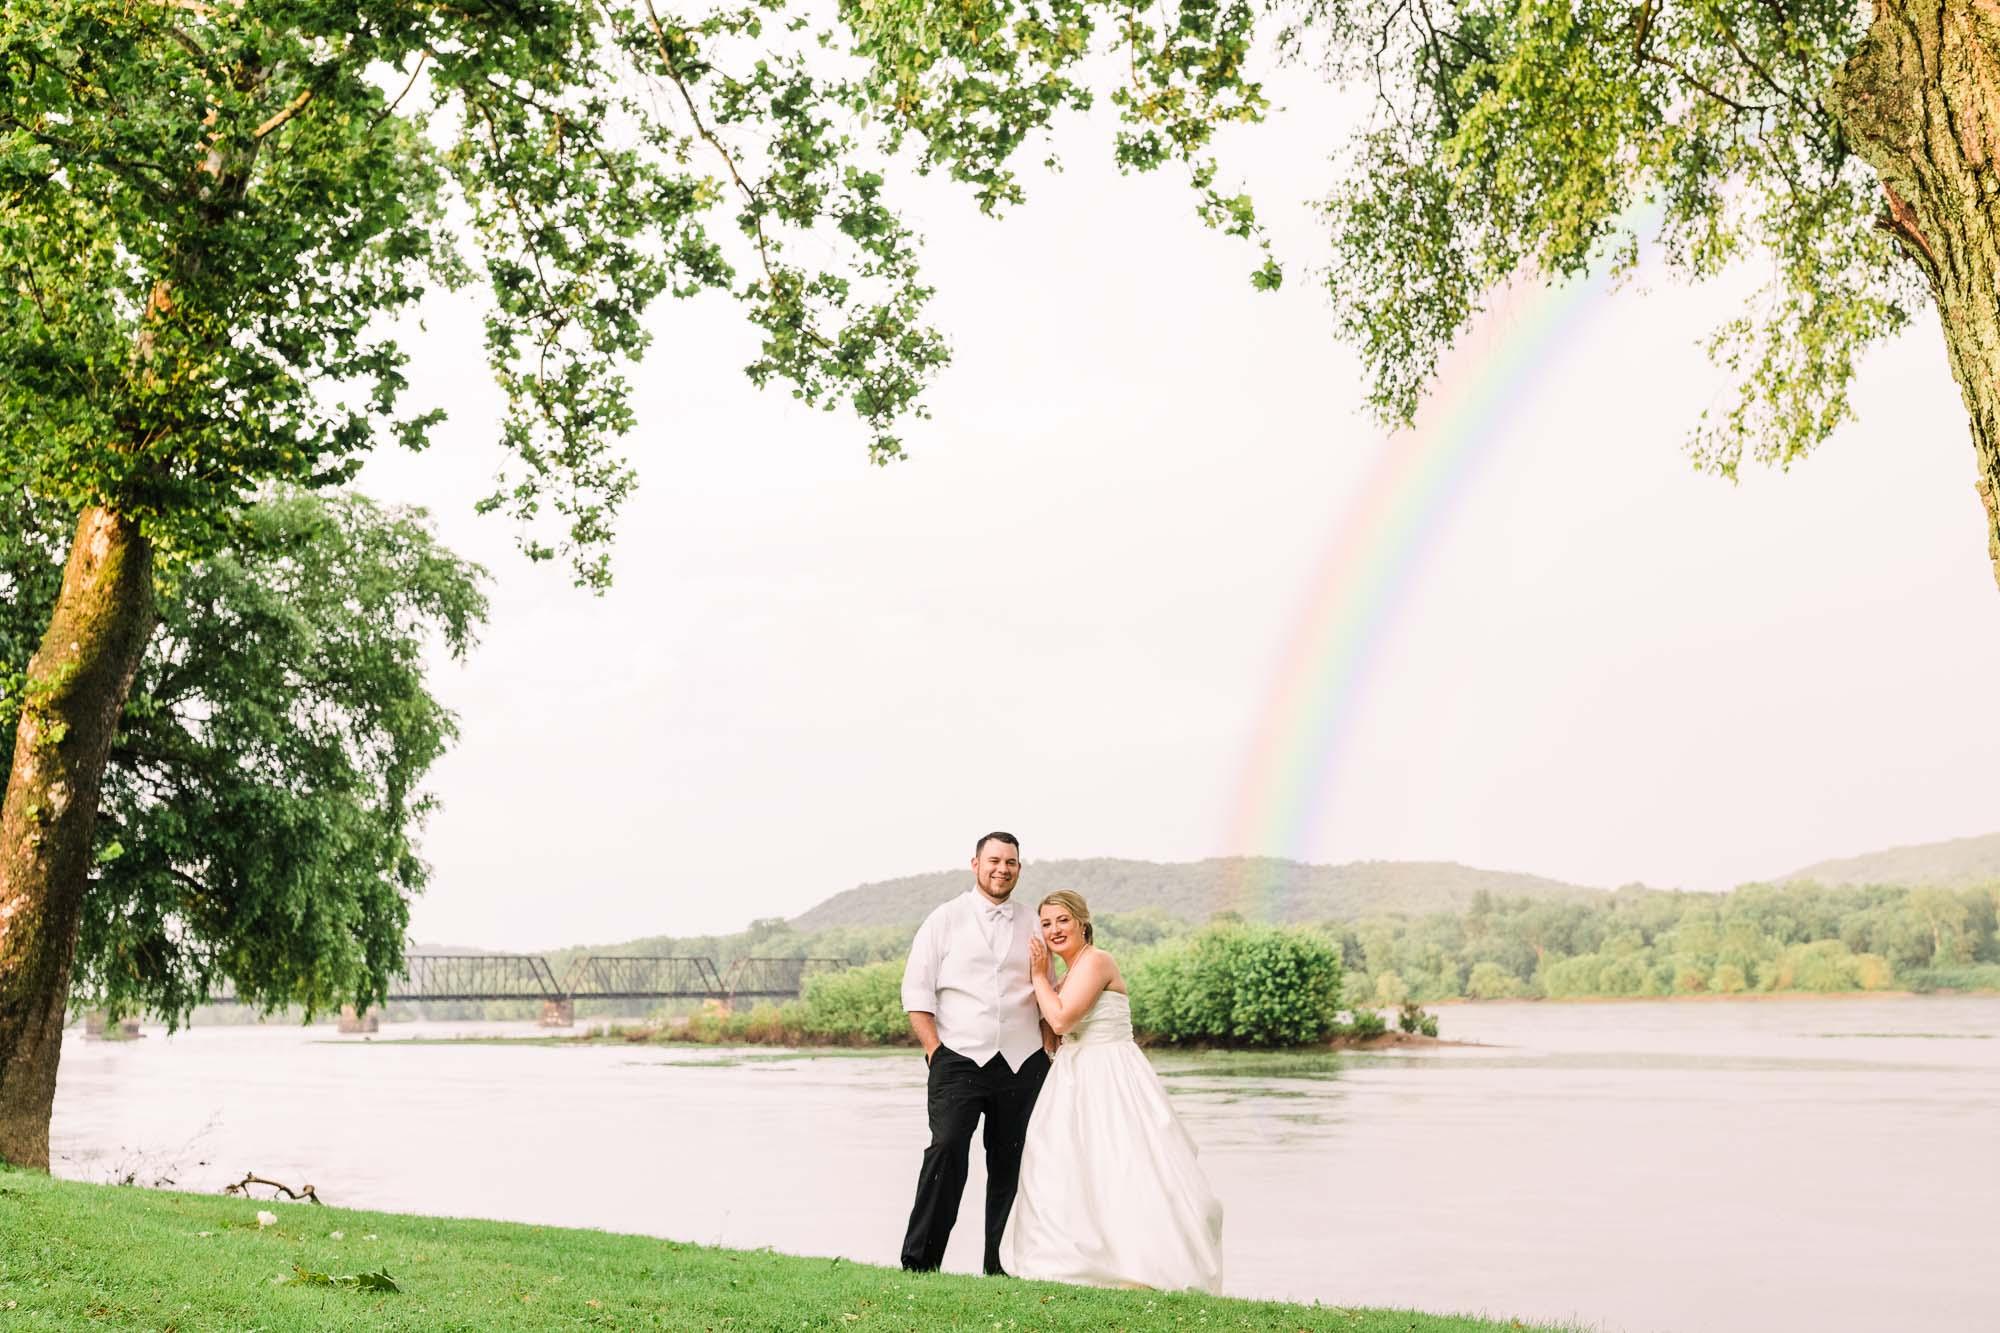 isle-of-que-wedding-7254.jpg